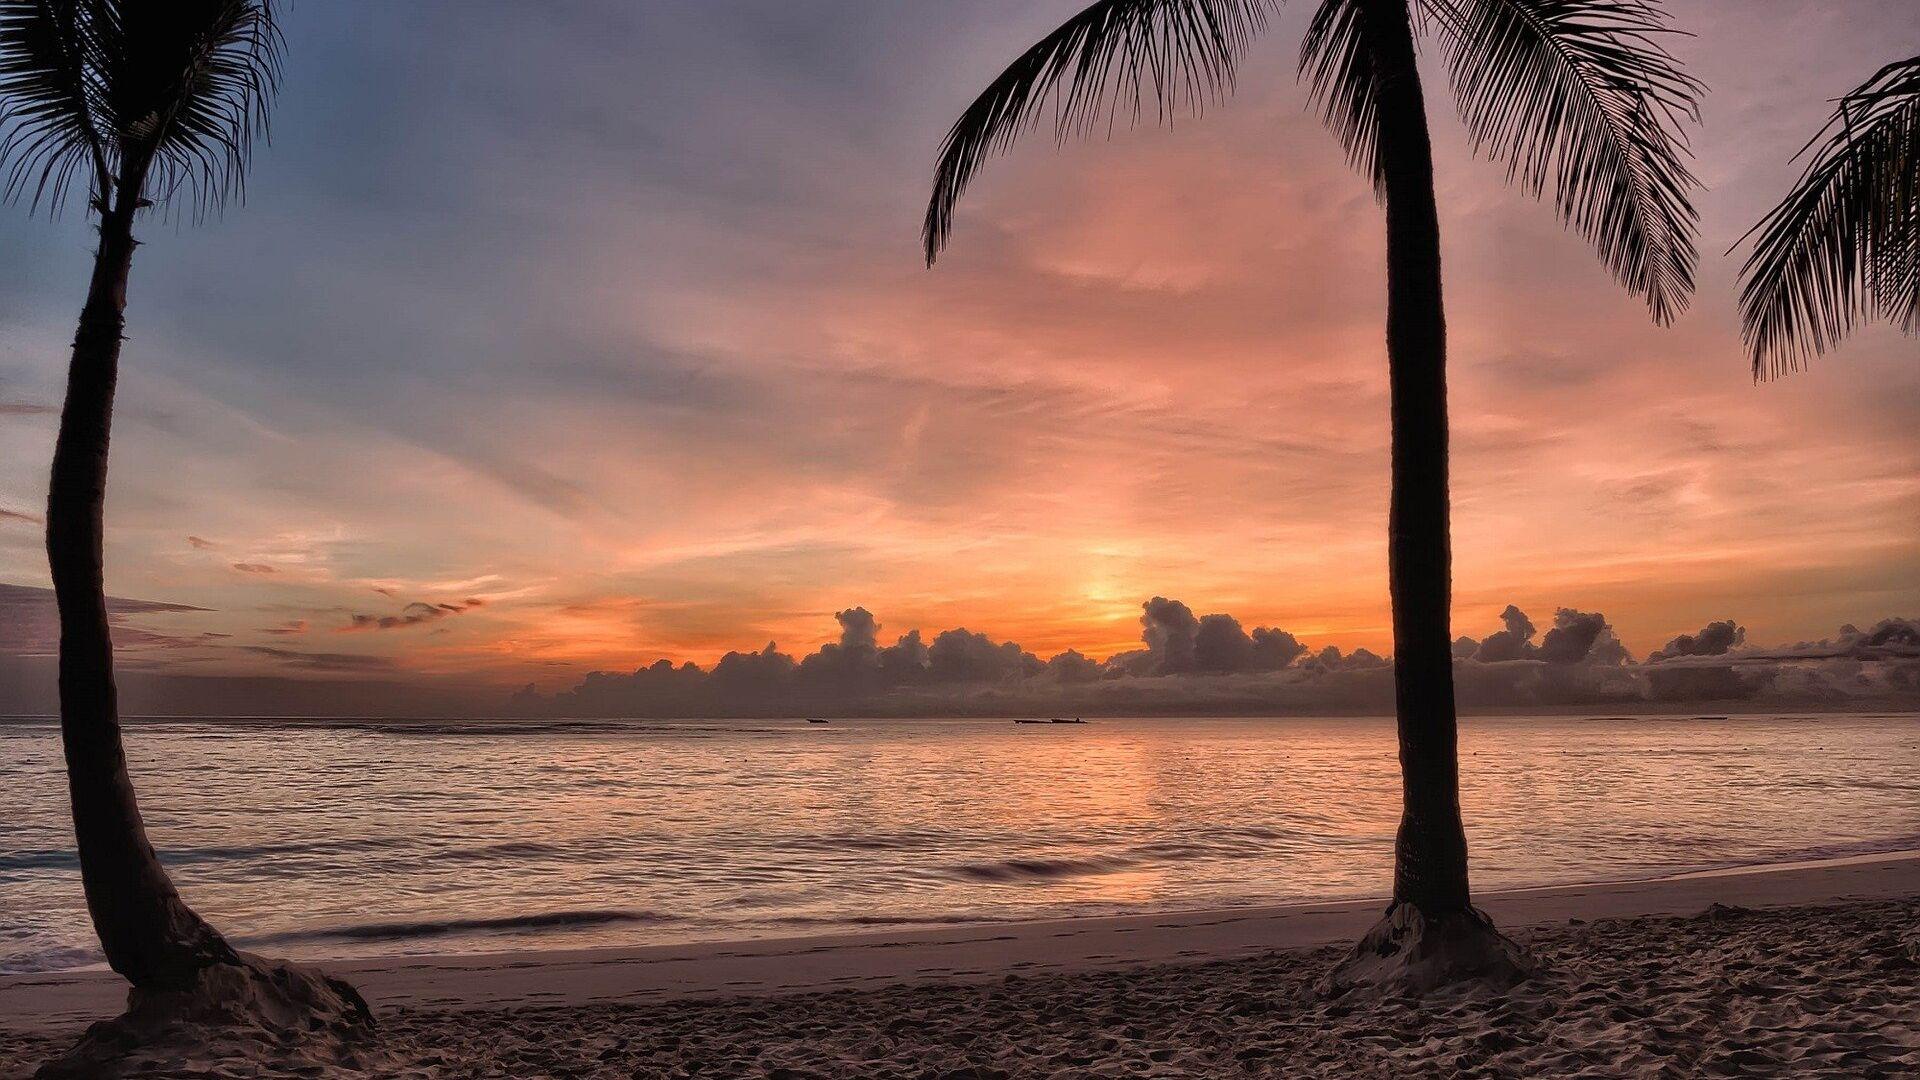 Spiaggia ai Caraibi al tramonto - Sputnik Italia, 1920, 06.08.2021